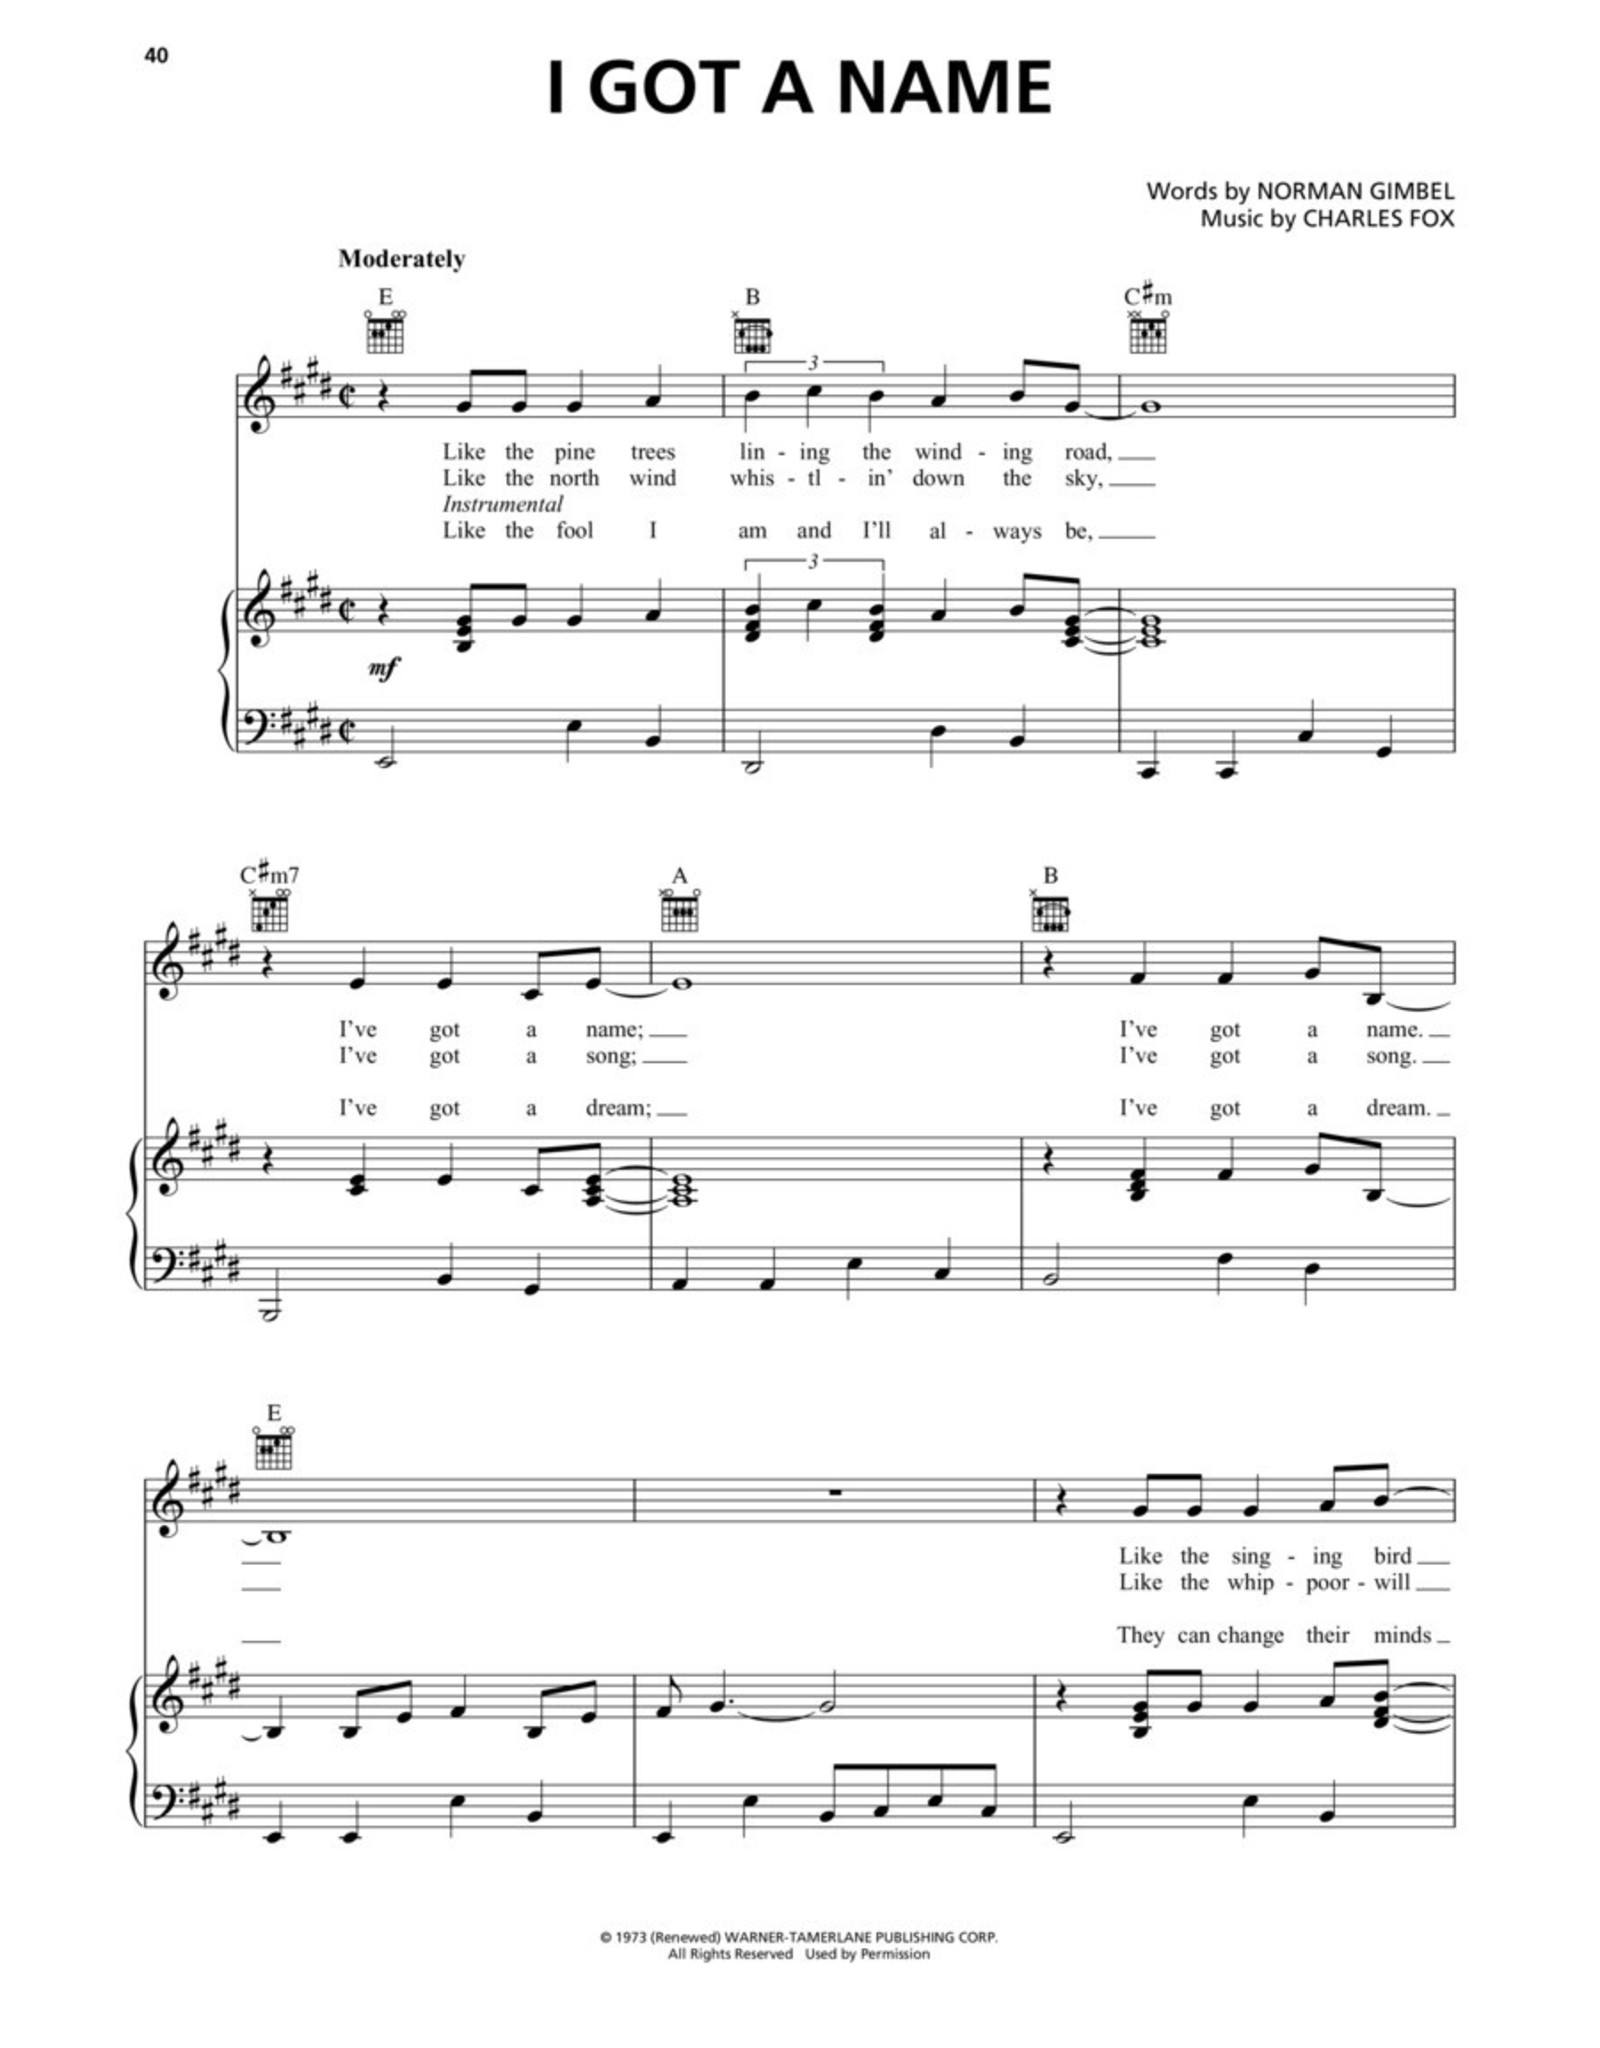 Hal Leonard Freedom Rock - 40 Songs that Defined an Era PVG